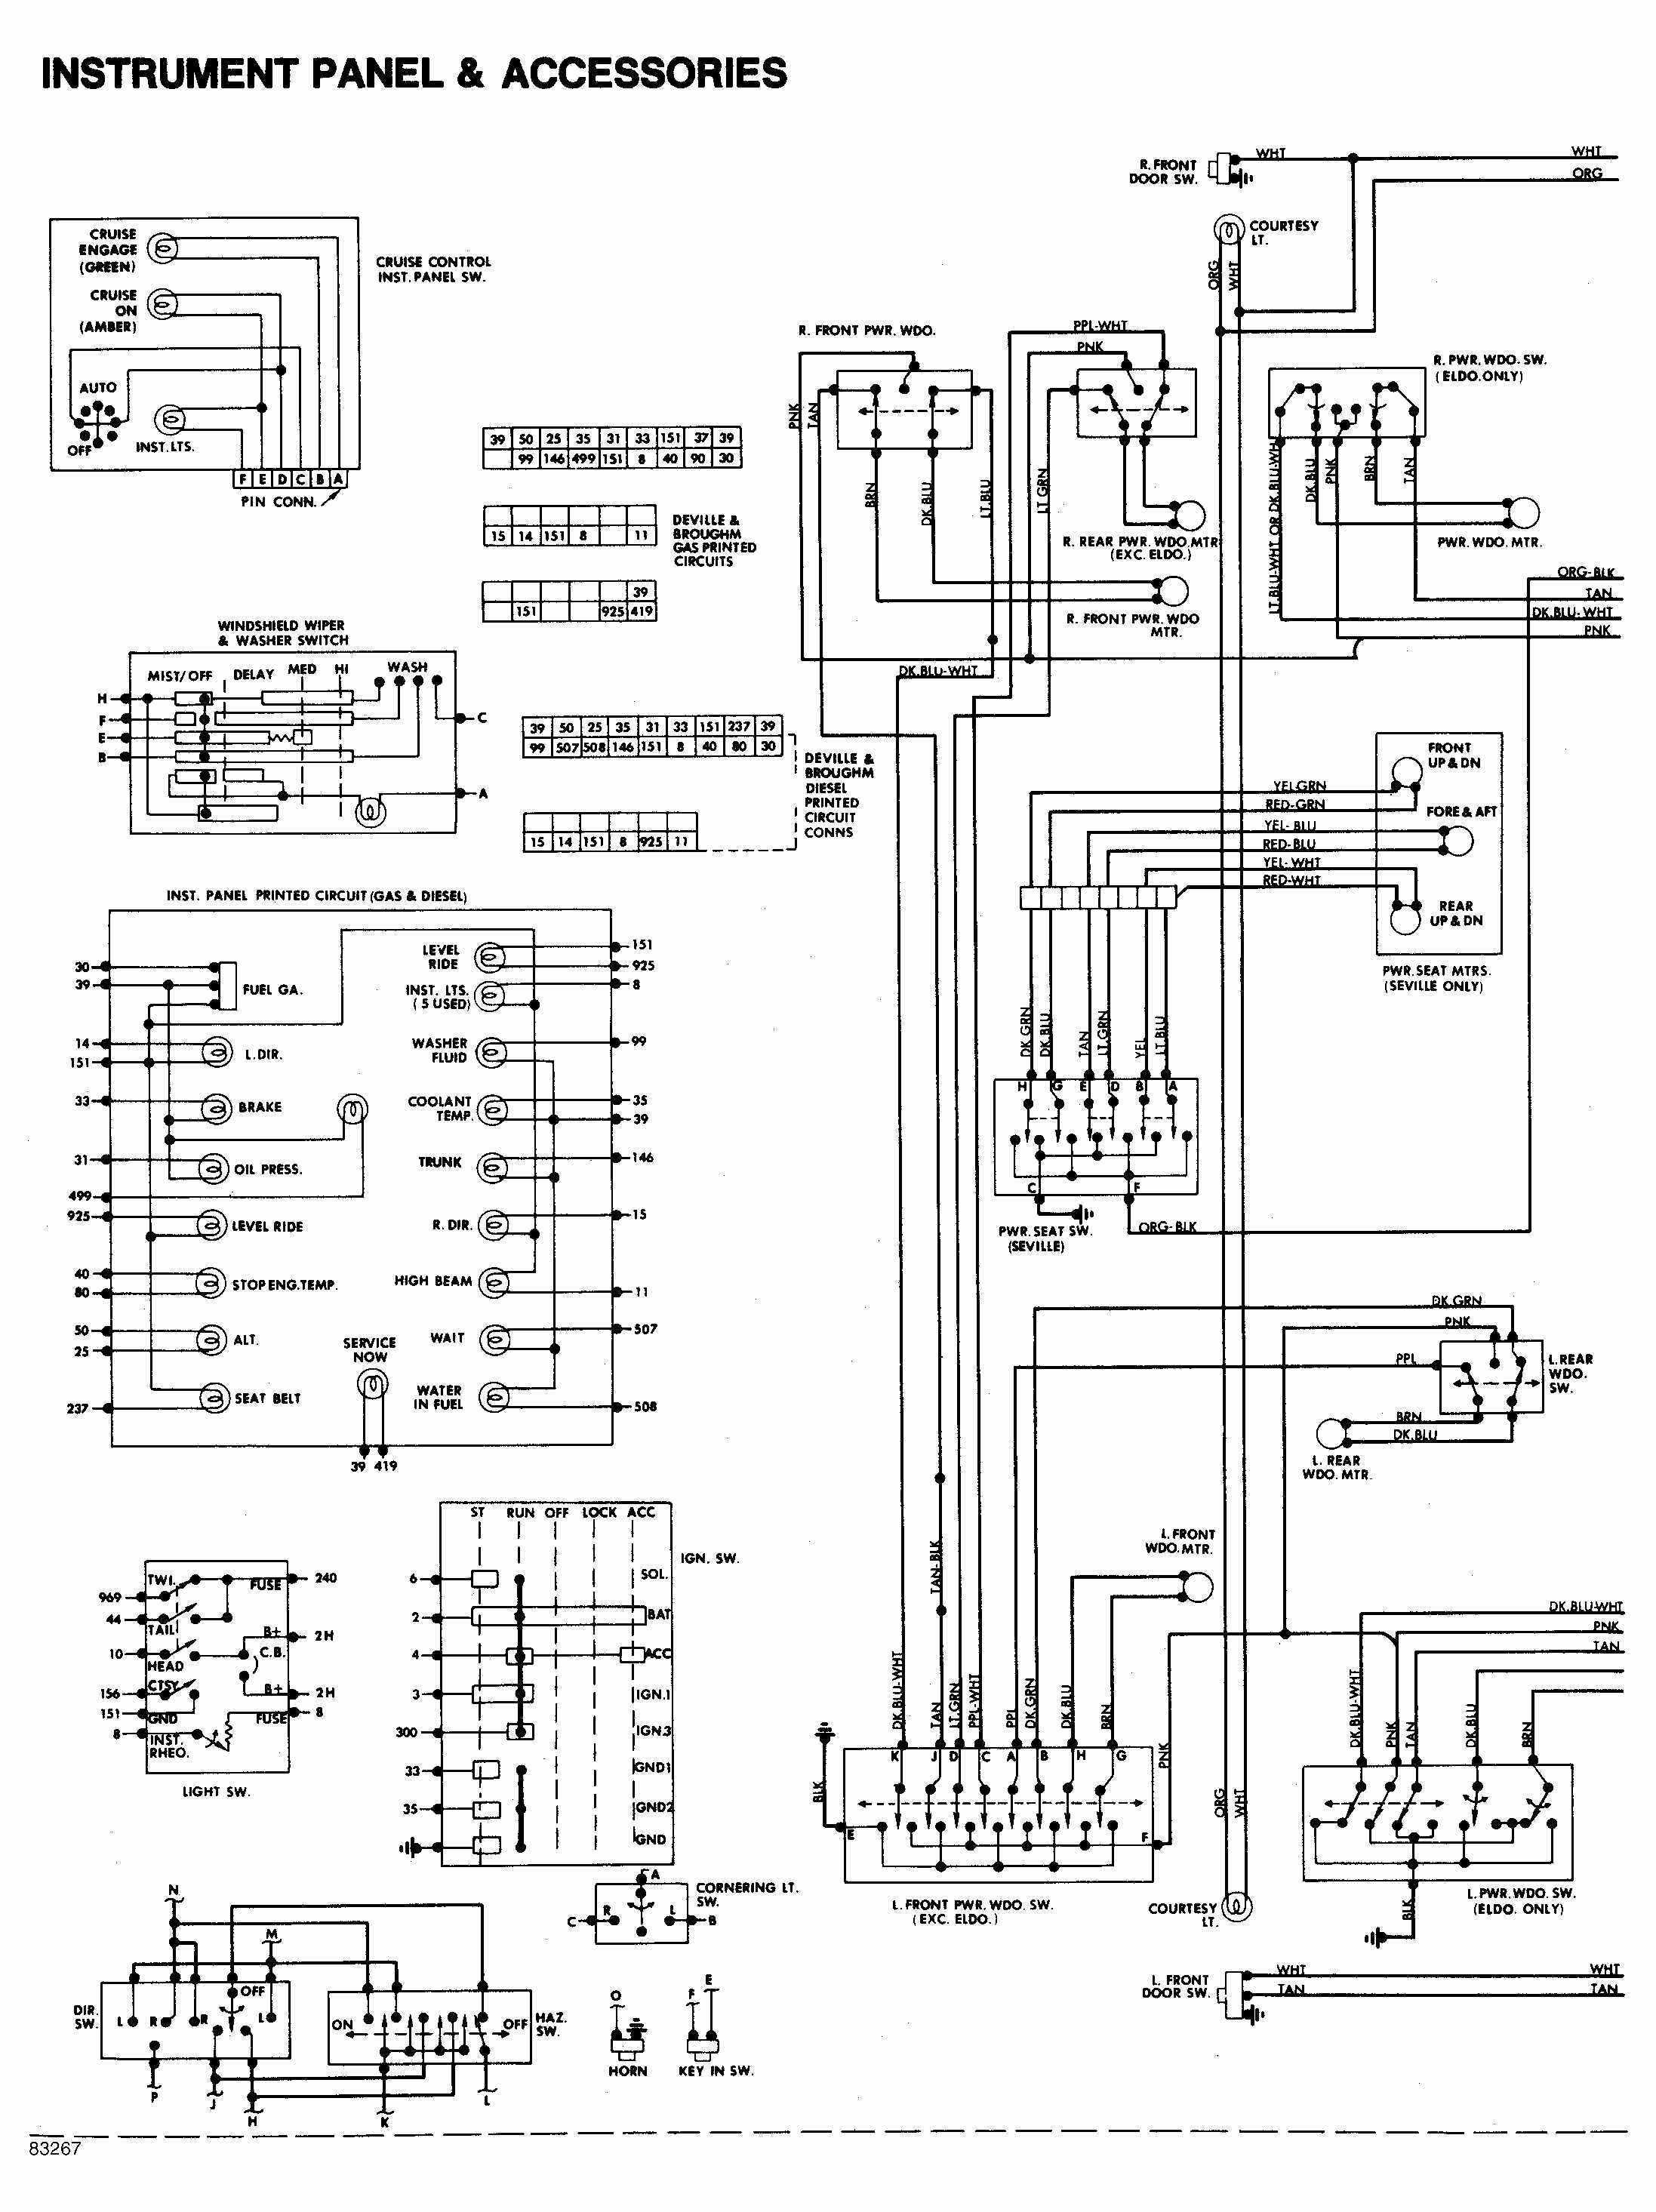 94 Cadillac Wiring Diagram Best Wiring Diagrams Free Asset Free Asset Ekoegur Es